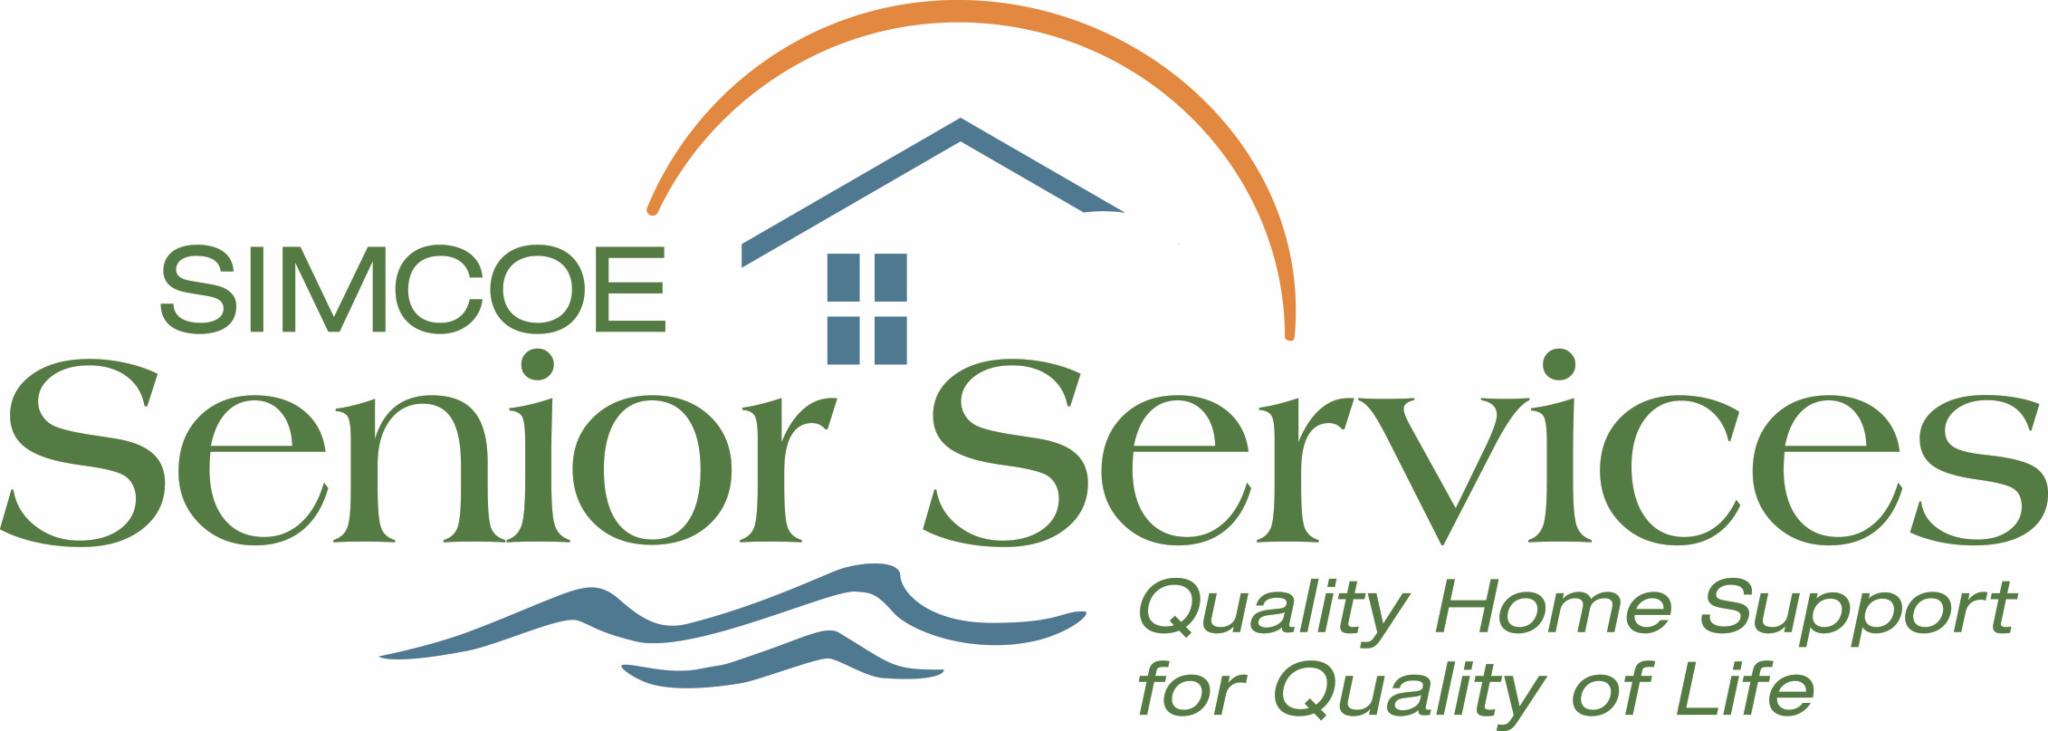 Simcoe Senior Services logo. Senior Home Care in Barrie and Simcoe County